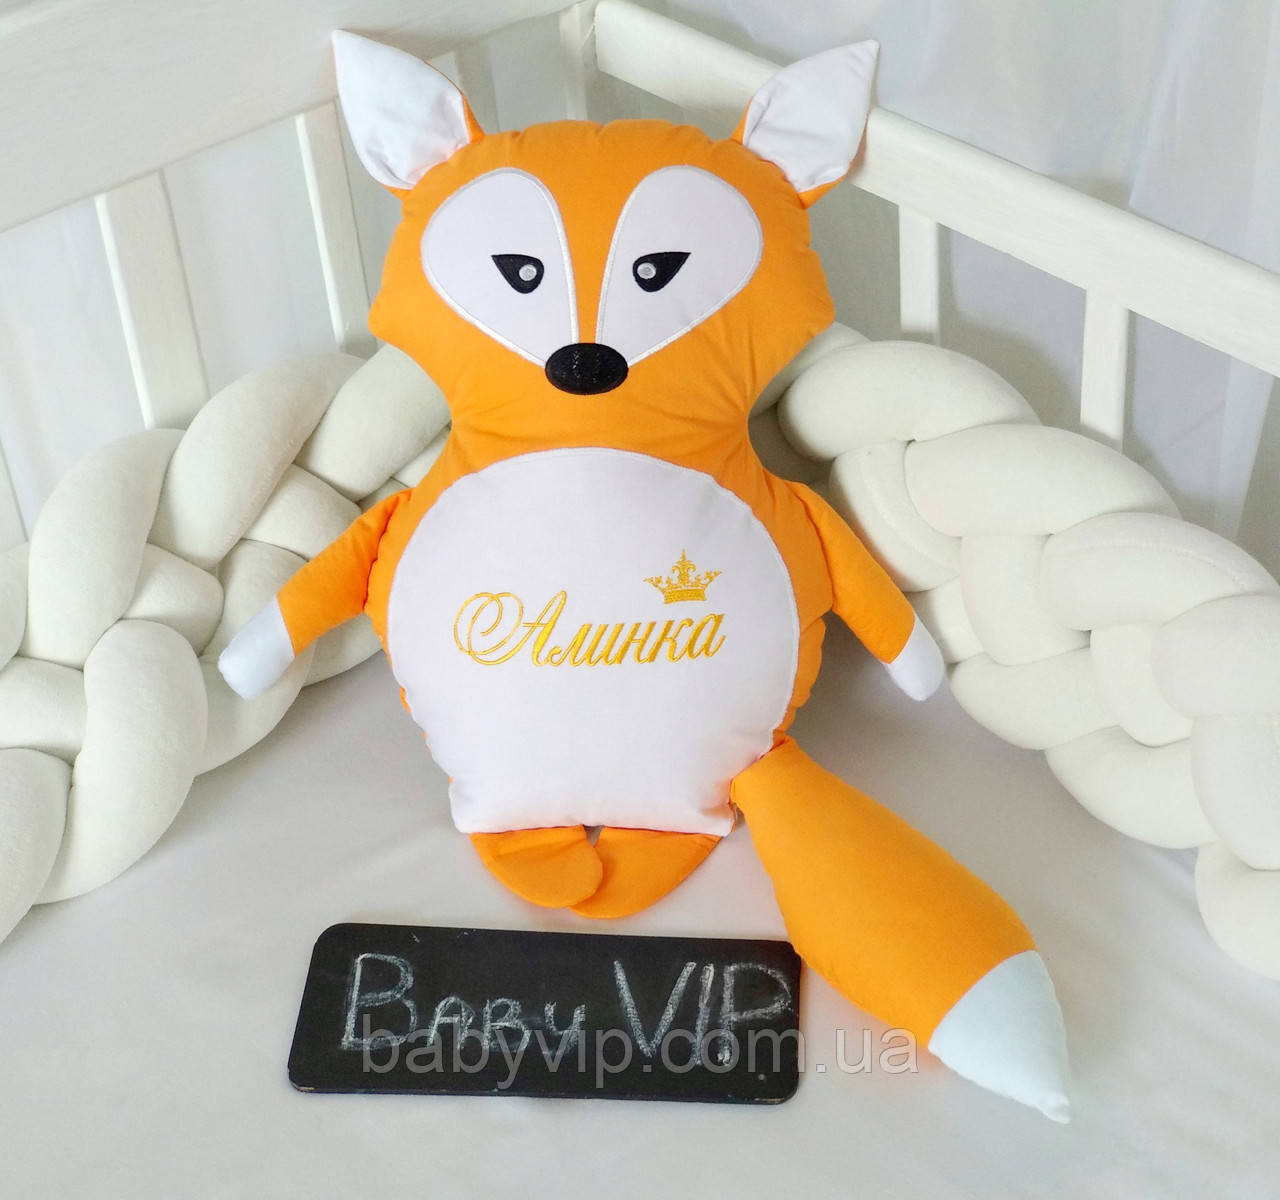 Лисичка игрушка с вышивкой имени